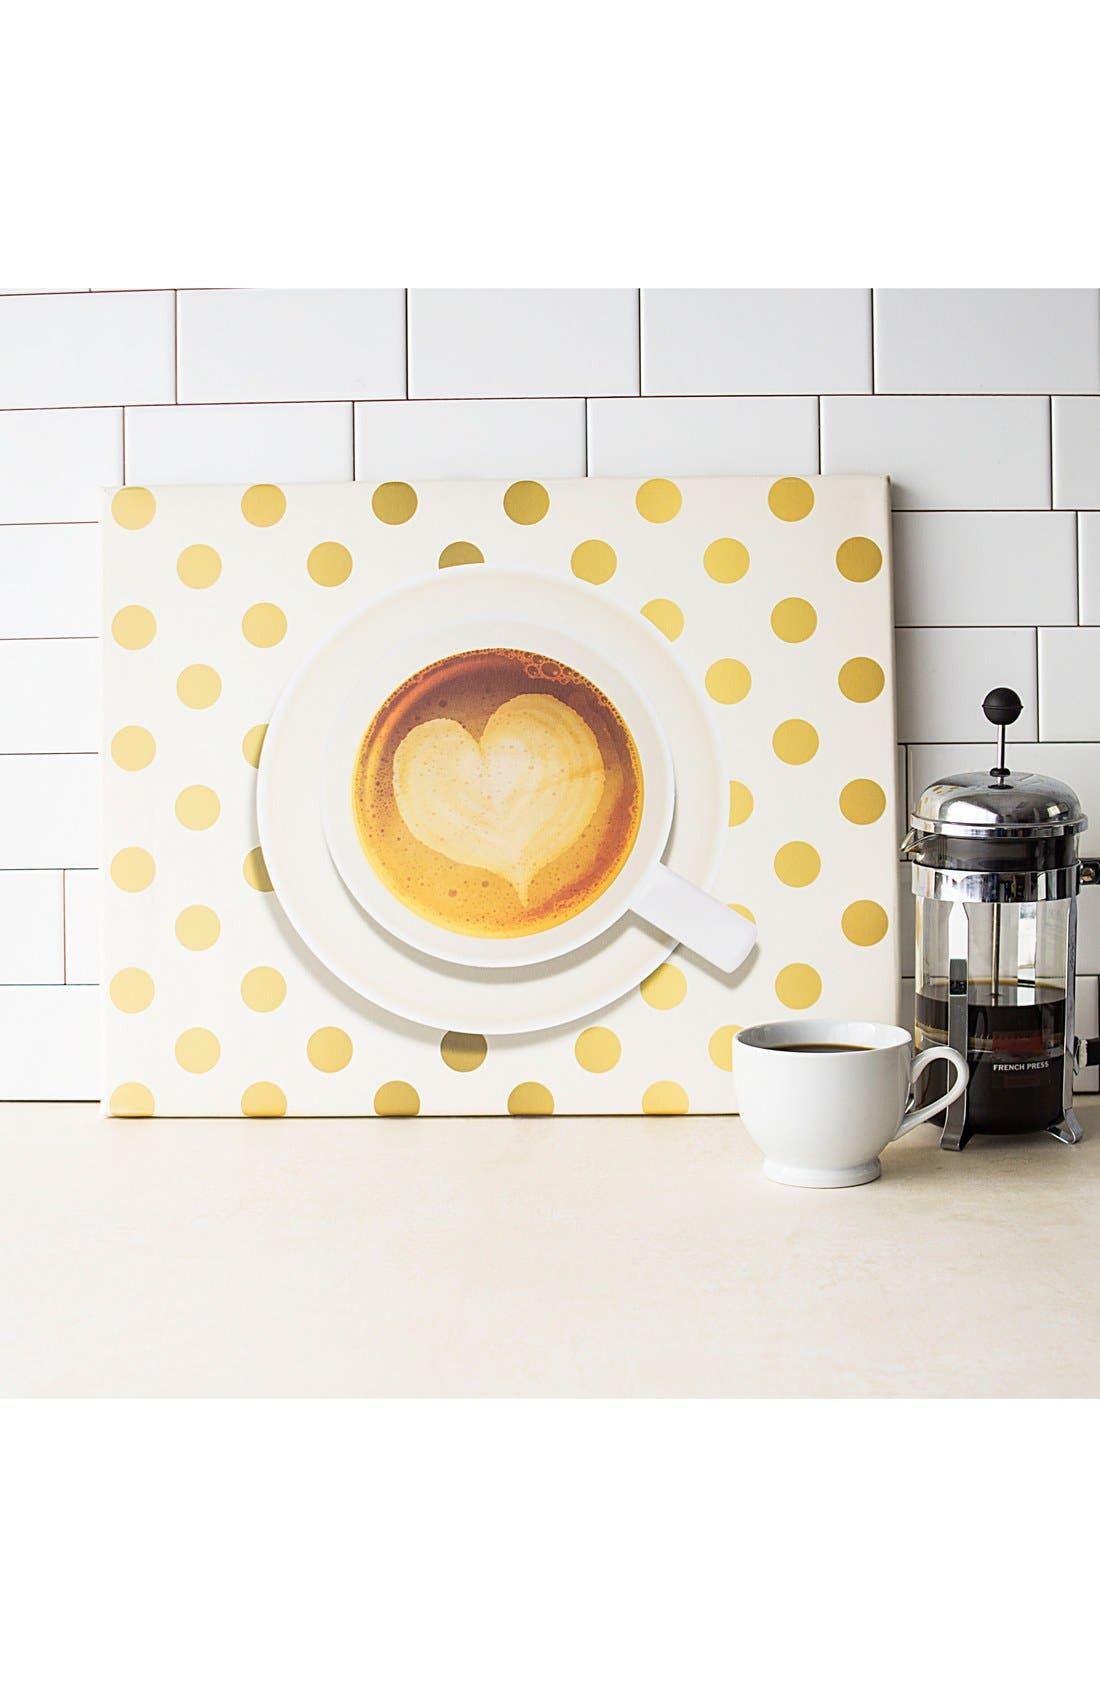 Cathy's Concepts Espresso Sign